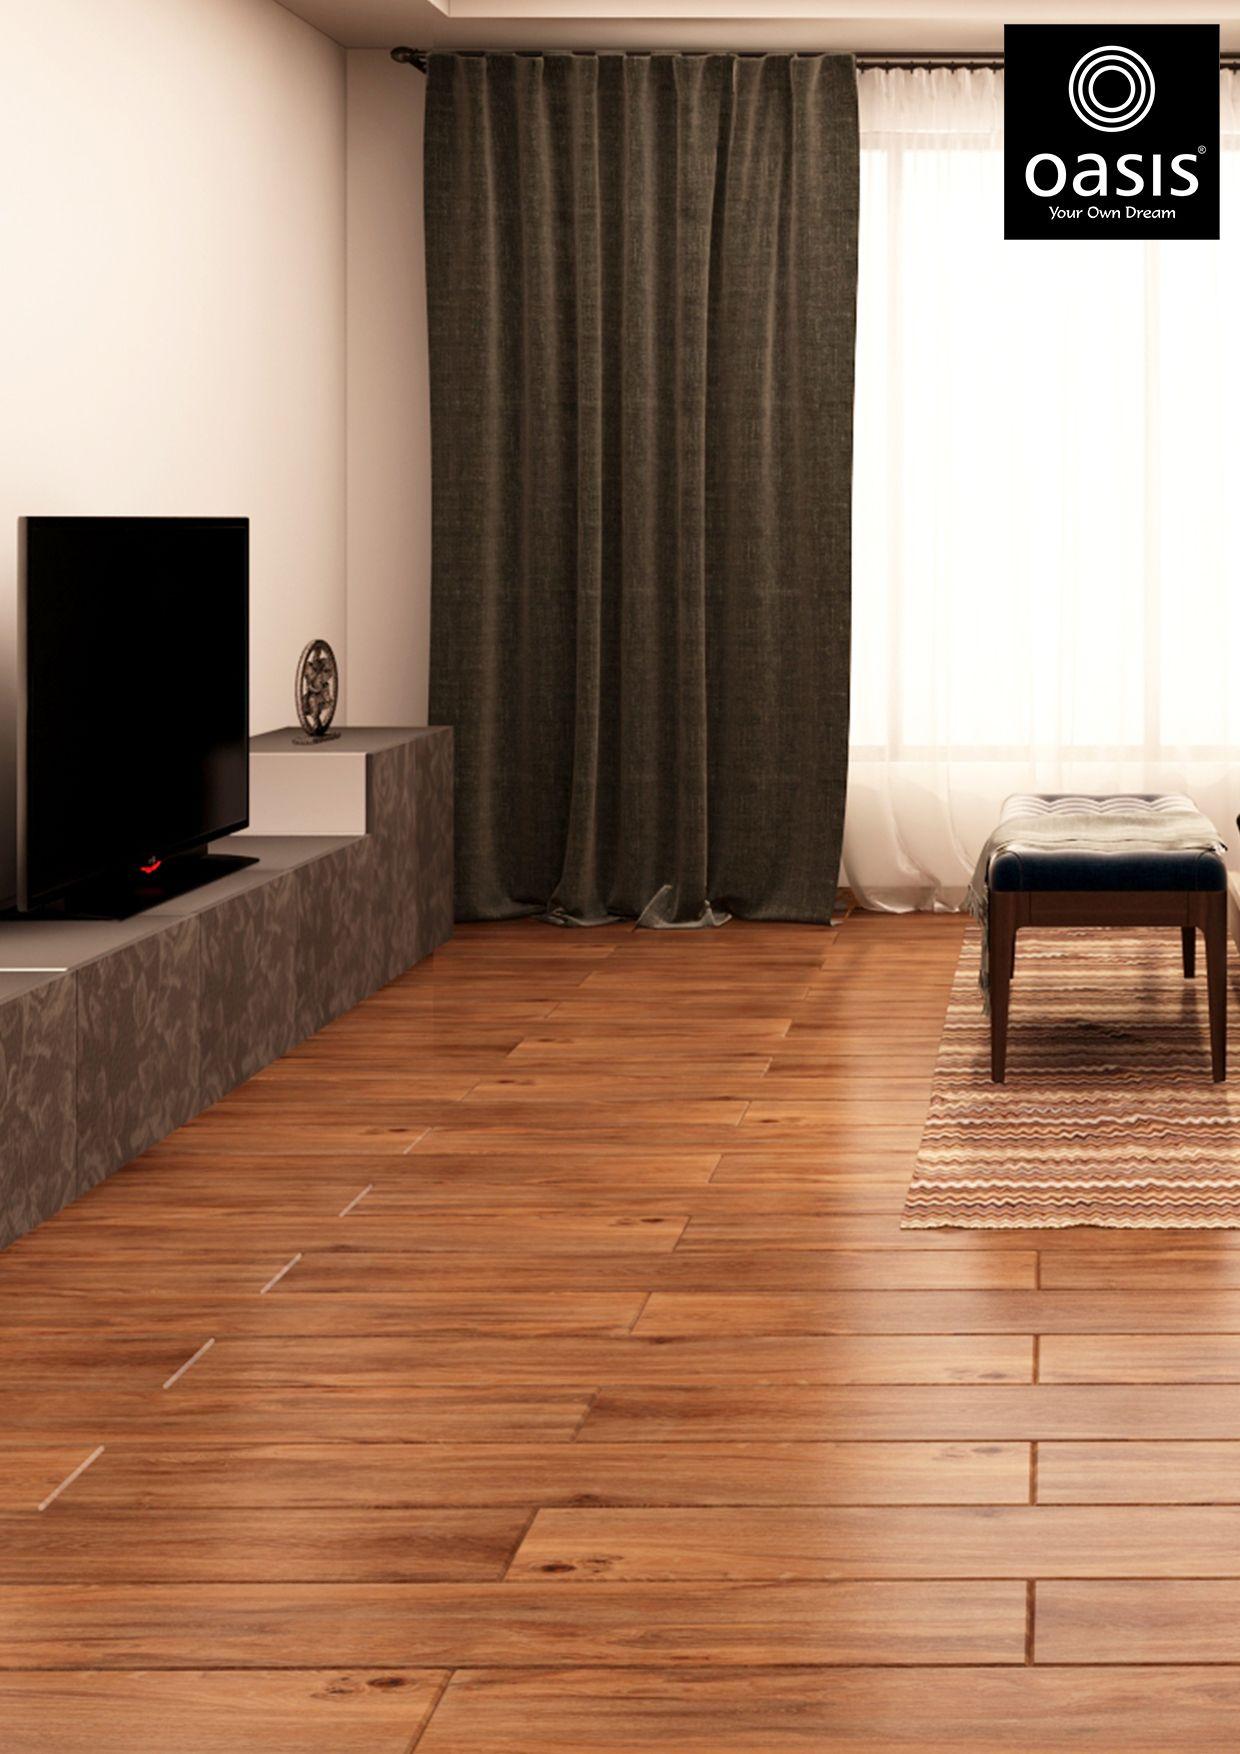 Pin By Oasis Tiles India On Best Floor Tiles For Living Room Floor Tile Design Wall Tiles Design Tile Design #wall #tile #design #for #living #room